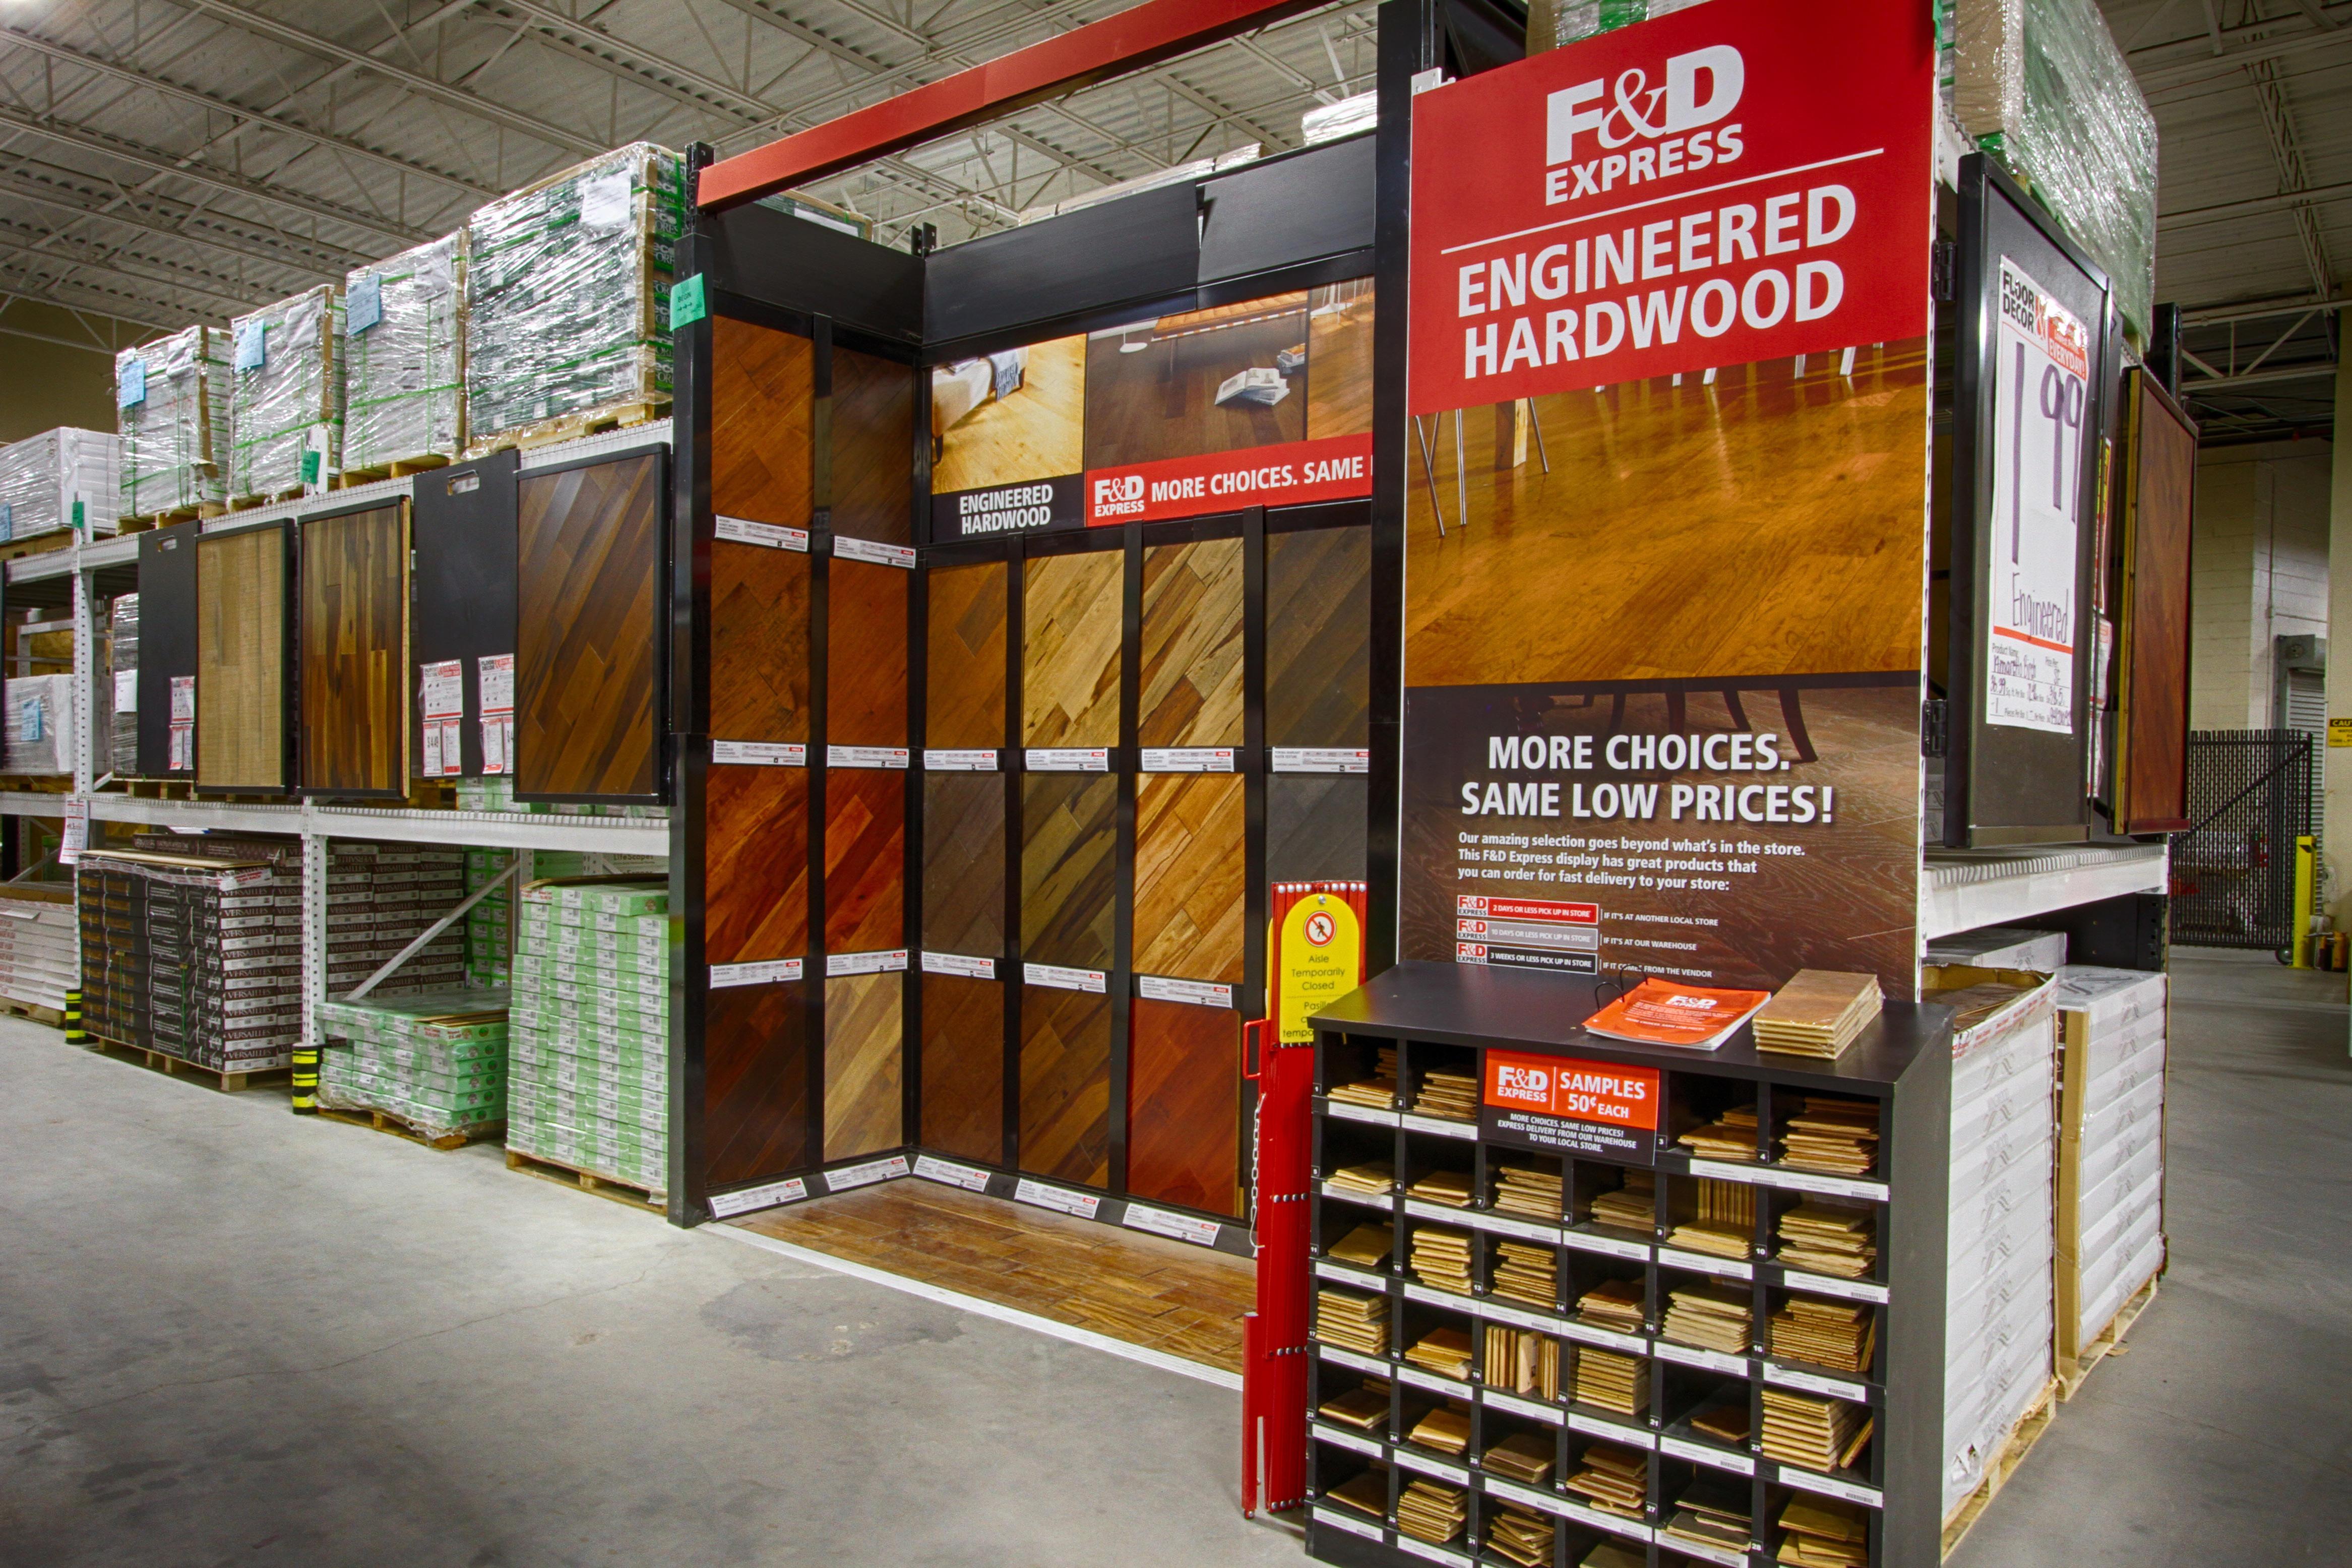 floor amp decor in gretna la 70053 chamberofcommerce com floor amp decor 26 photos amp 12 reviews kitchen amp bath